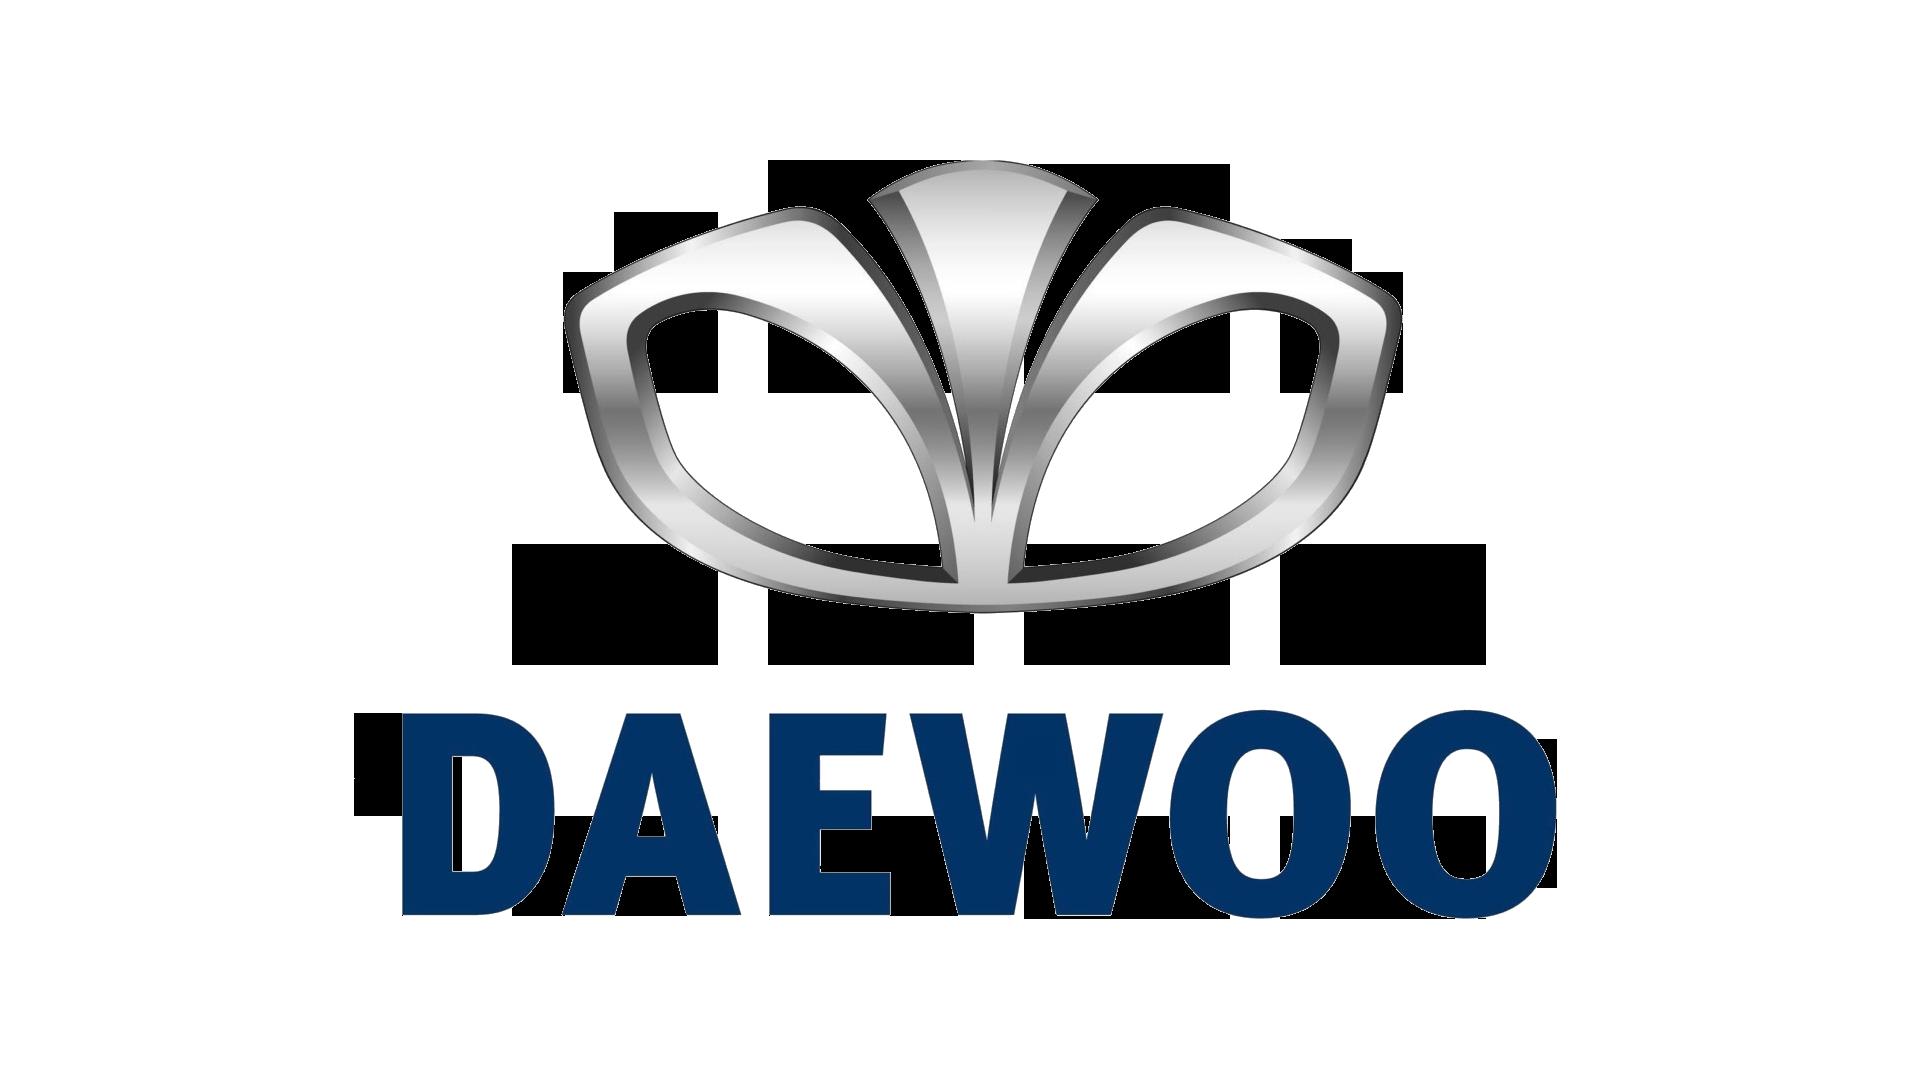 Daewoo Logo, HD Png, Information Car logos, Car emblem